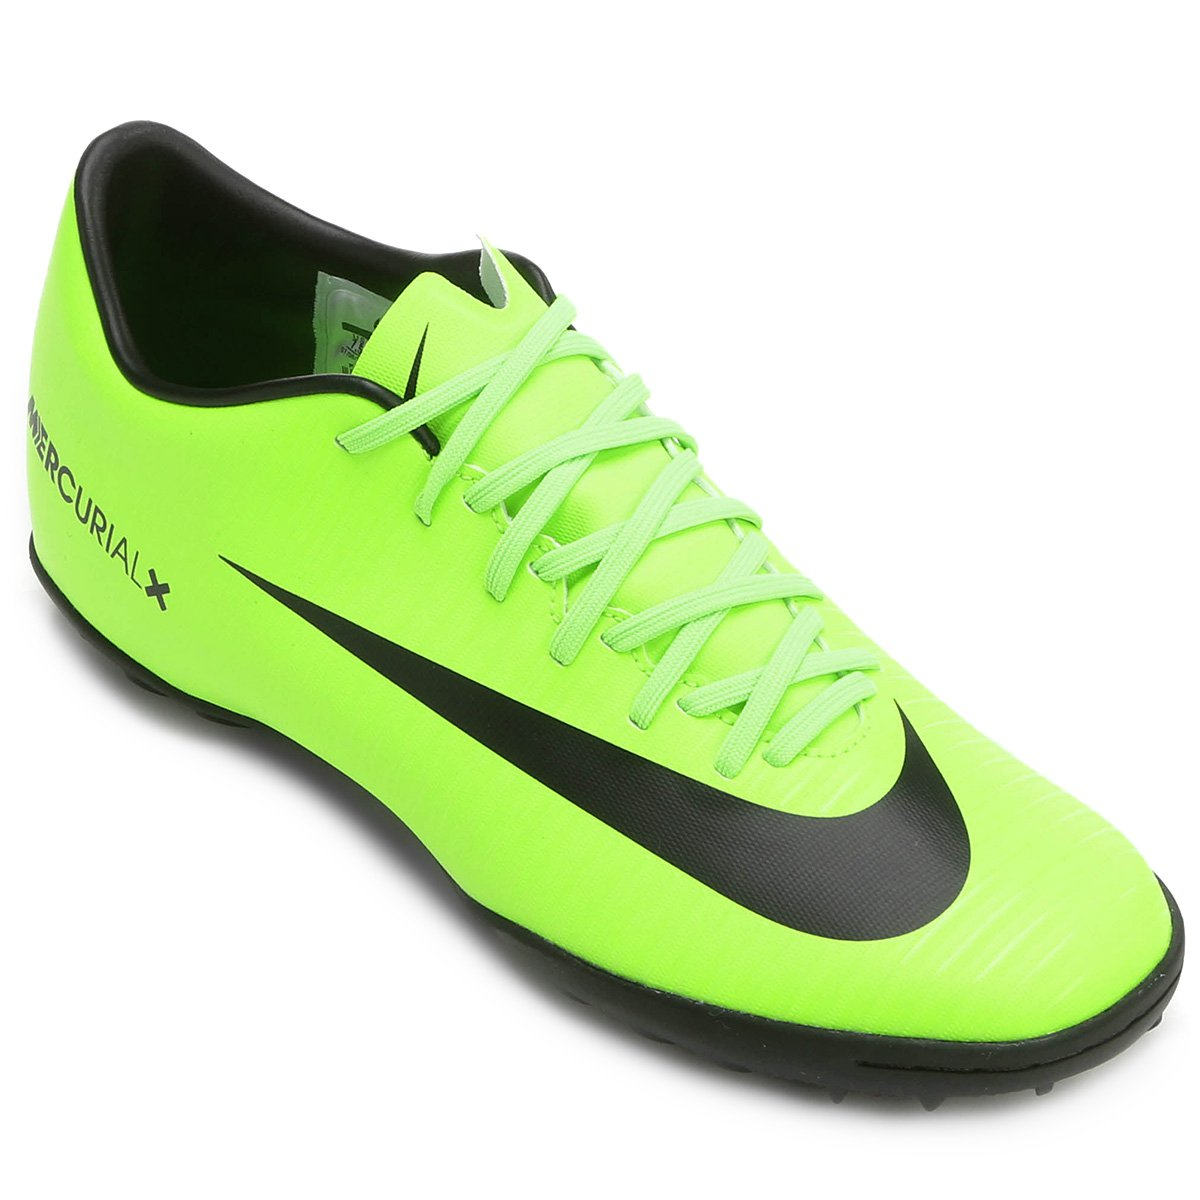 Chuteira Society Nike Mercurial Victory 6 TF - Verde e Preto ... 1bf0a540ded73